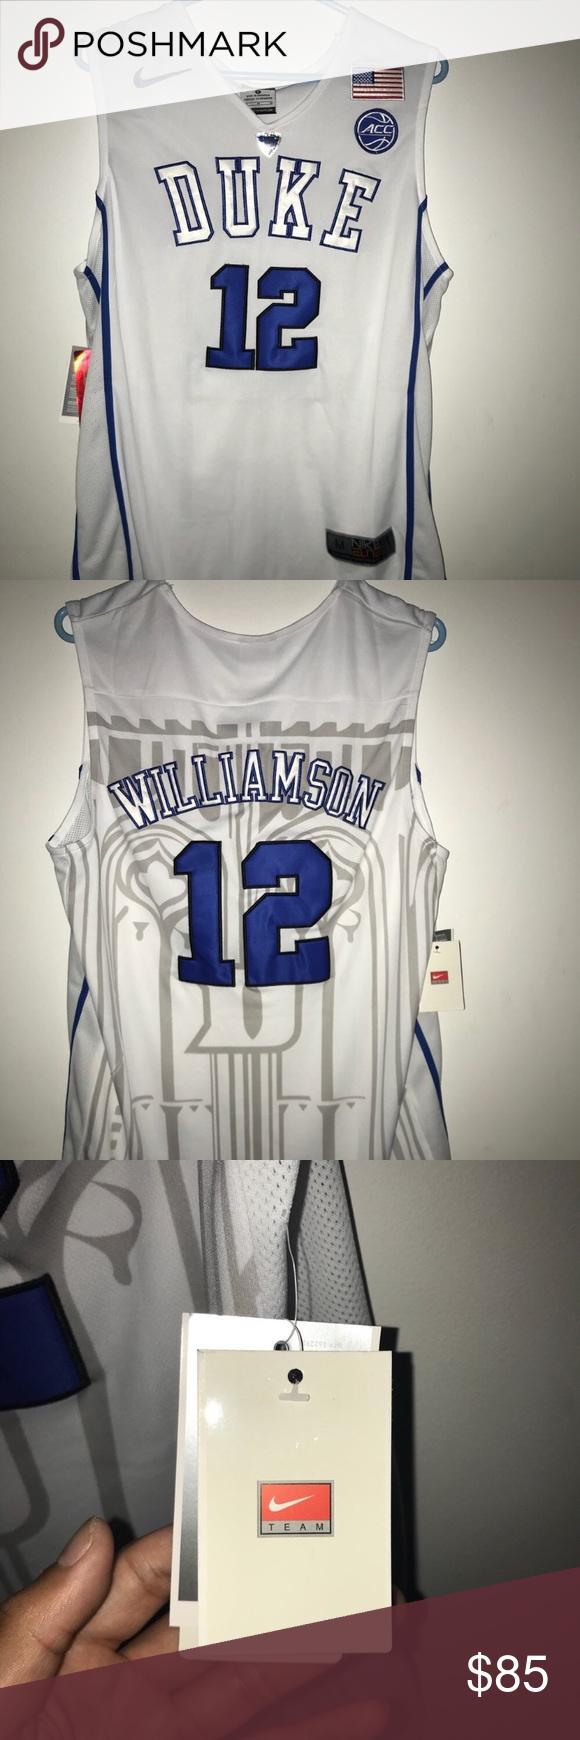 new concept 4fc7c 44372 Authentic NCAA Duke Zion Williamson Jersey Duke Blue Devils ...